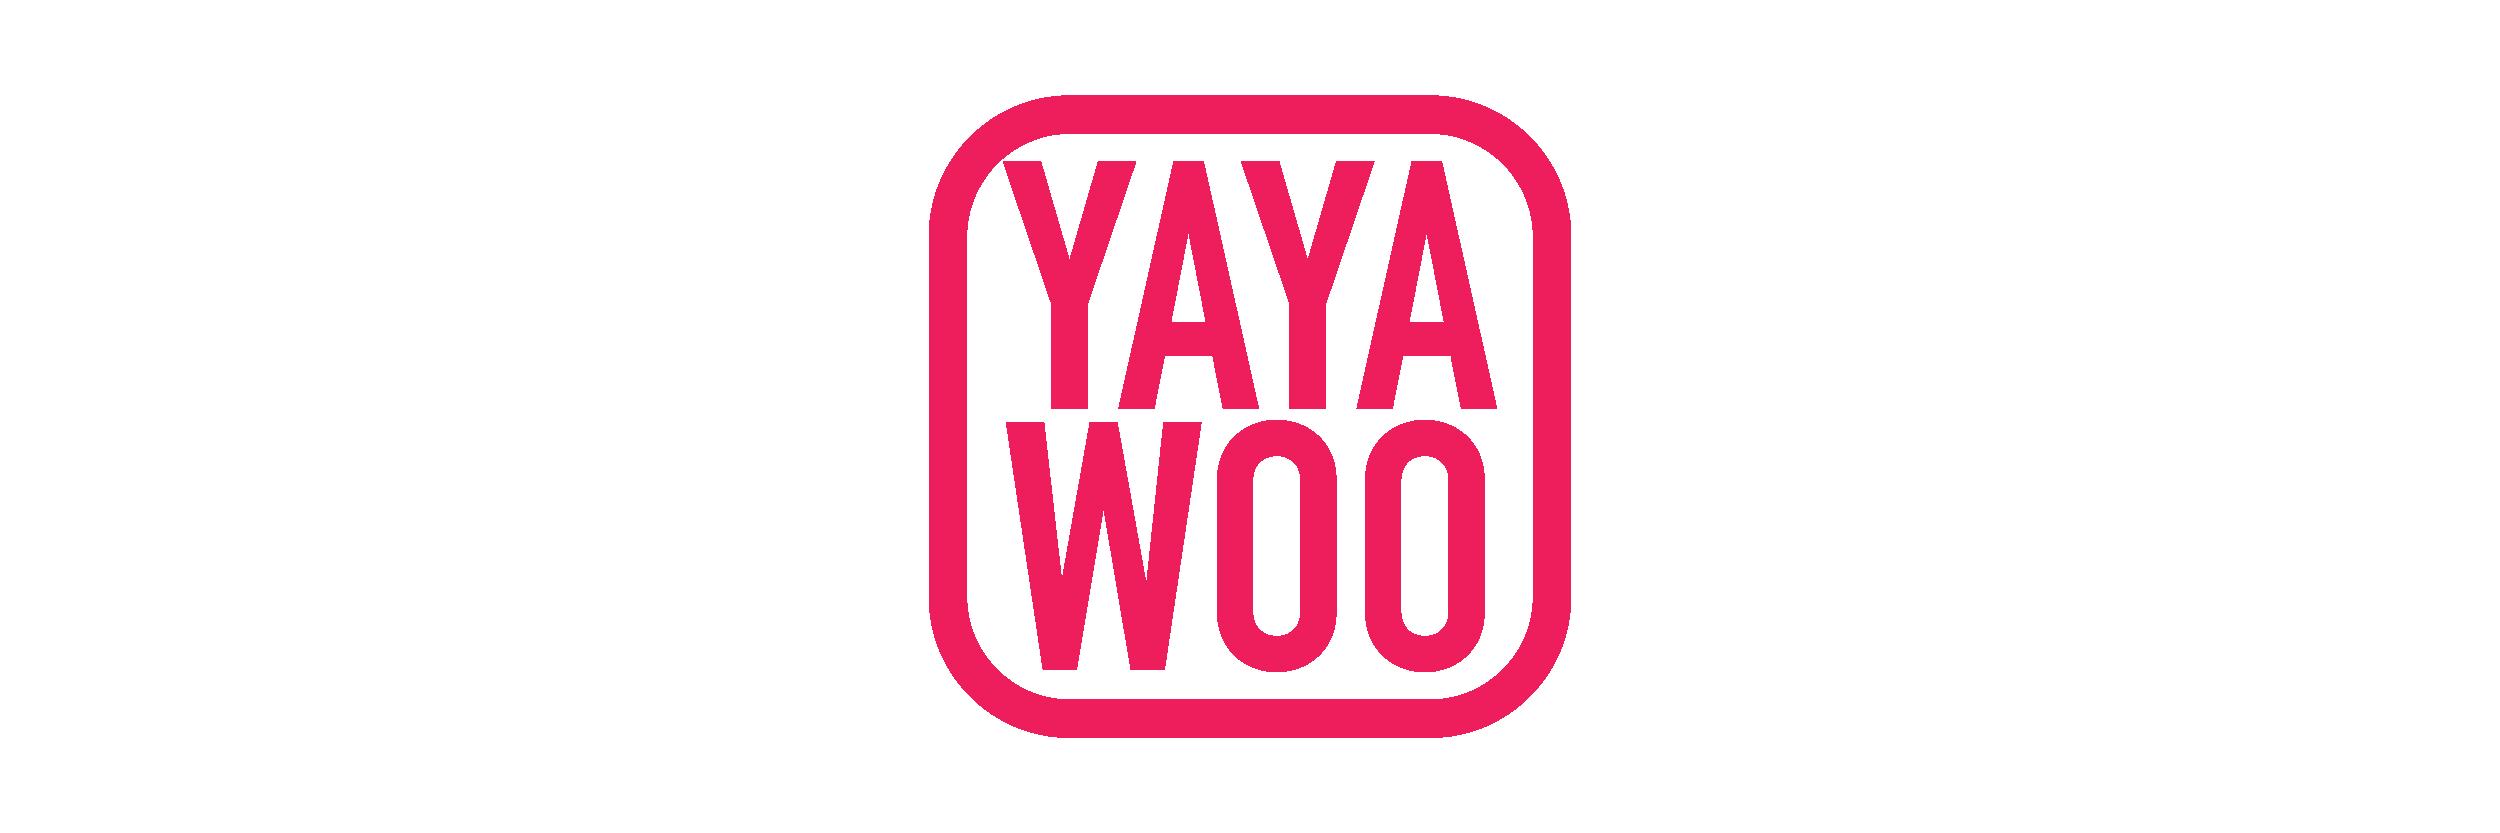 yayawoo's Signature